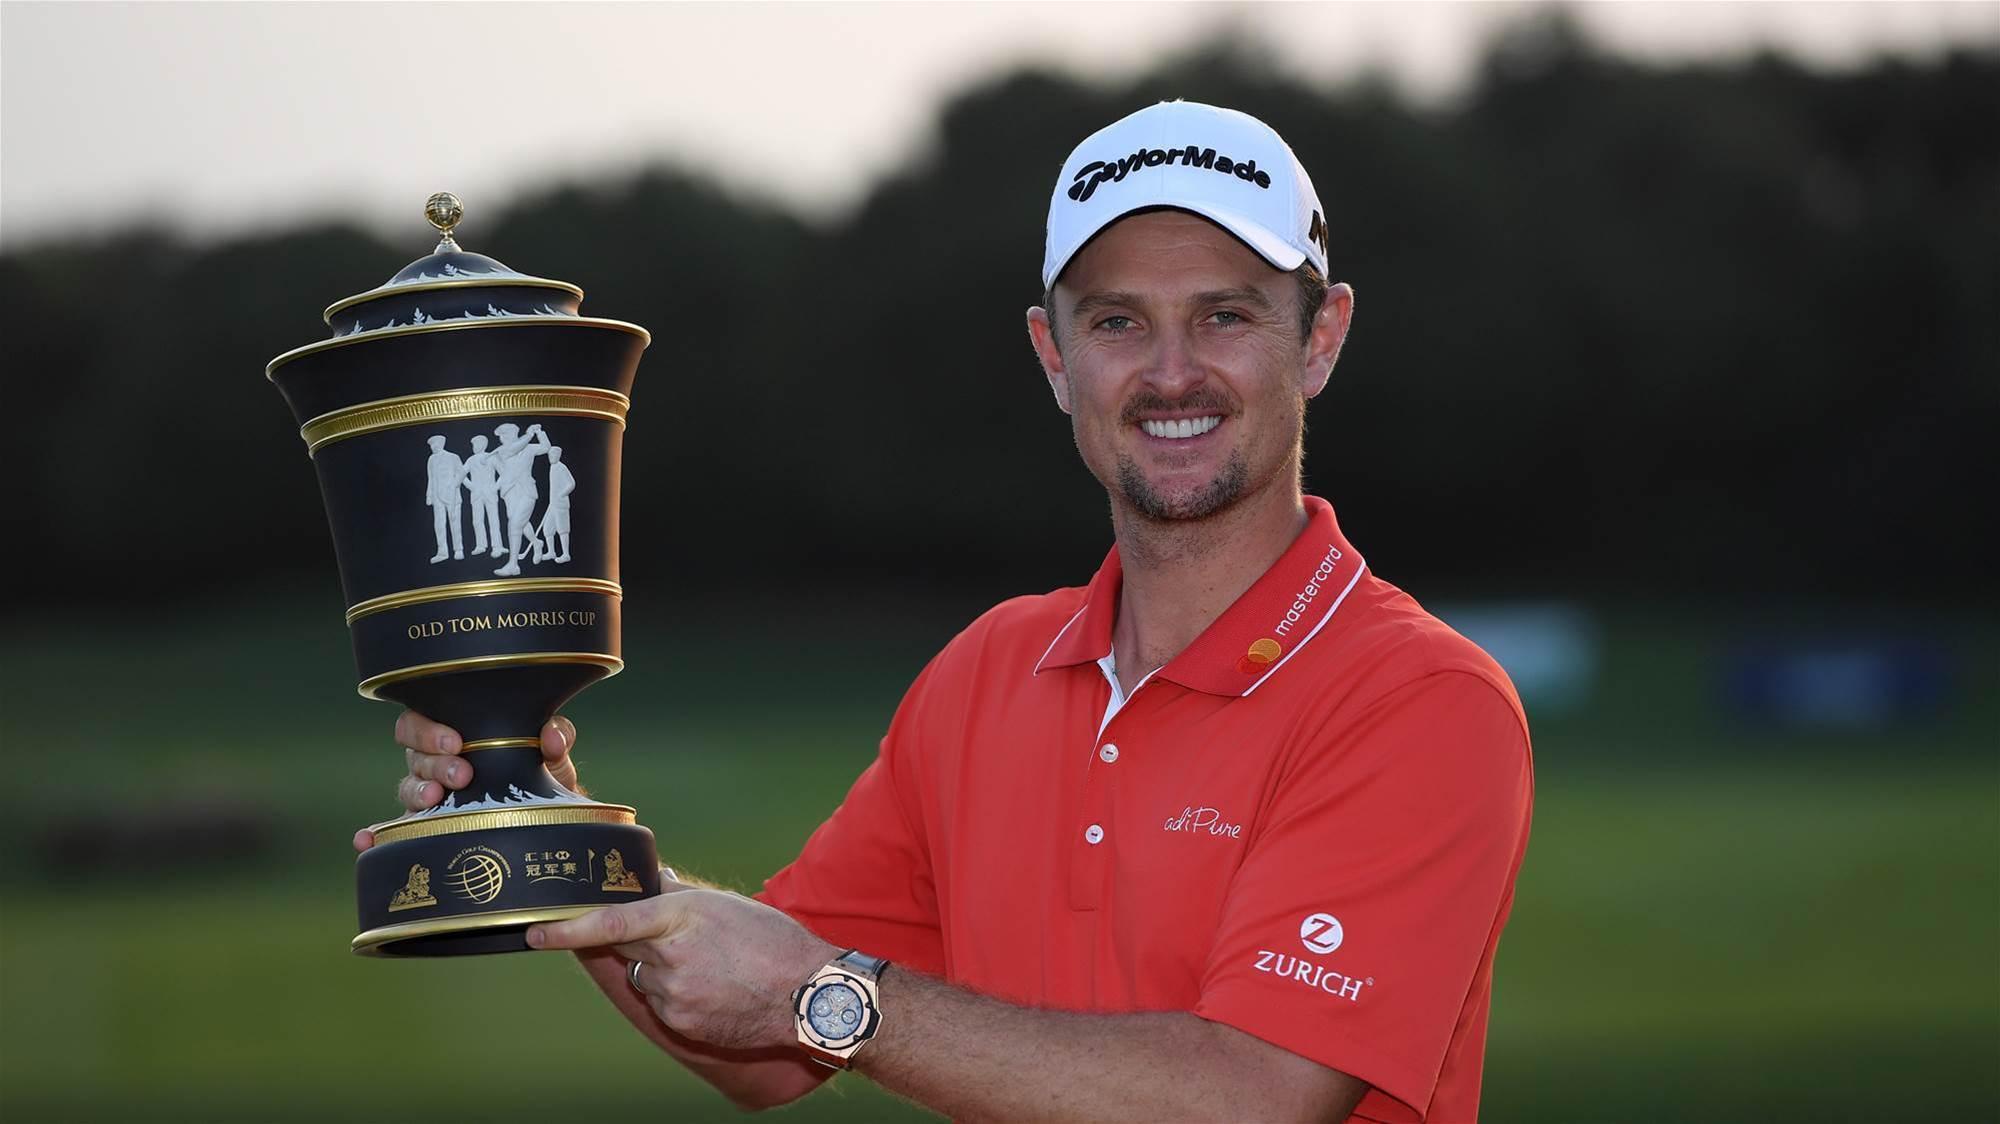 PGA TOUR: Rose comes from nowhere as Johnson stumbles